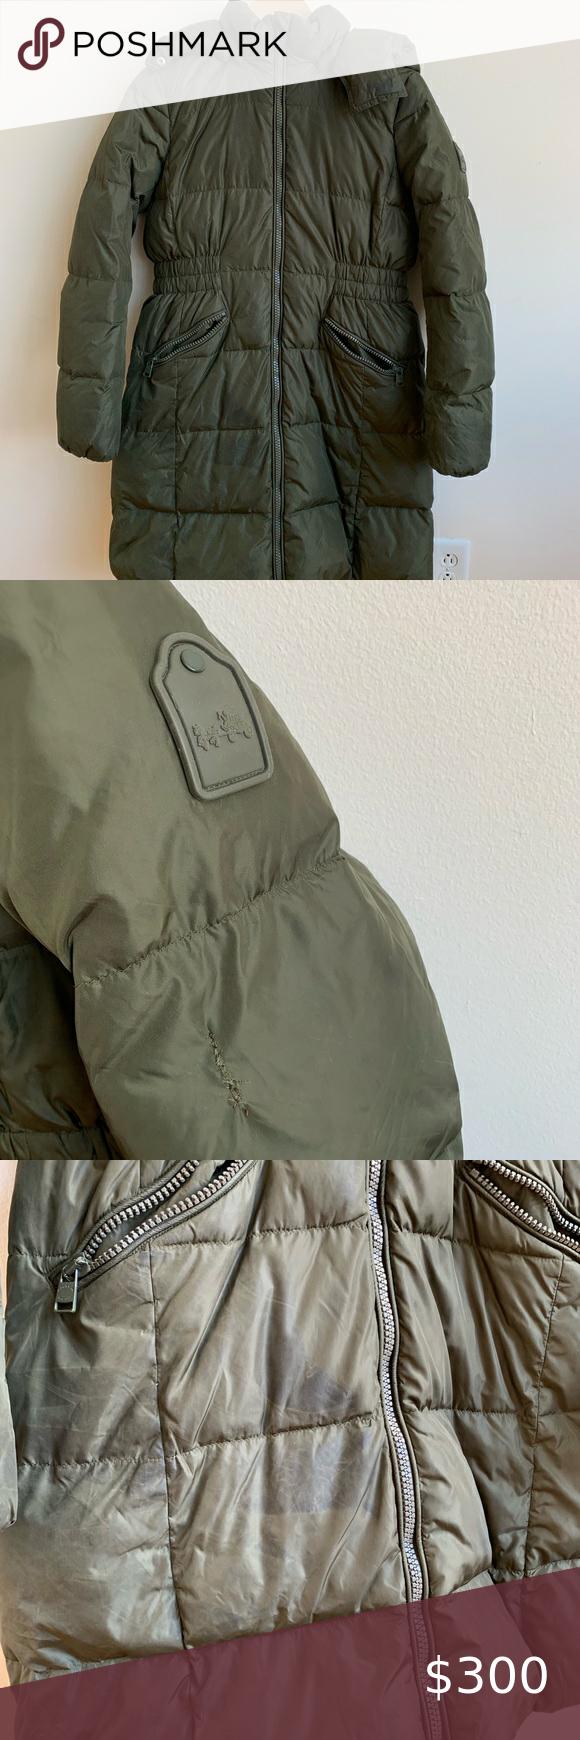 Coach Puffer Jacket Jackets Puffer Jackets Women Shopping [ 1740 x 580 Pixel ]